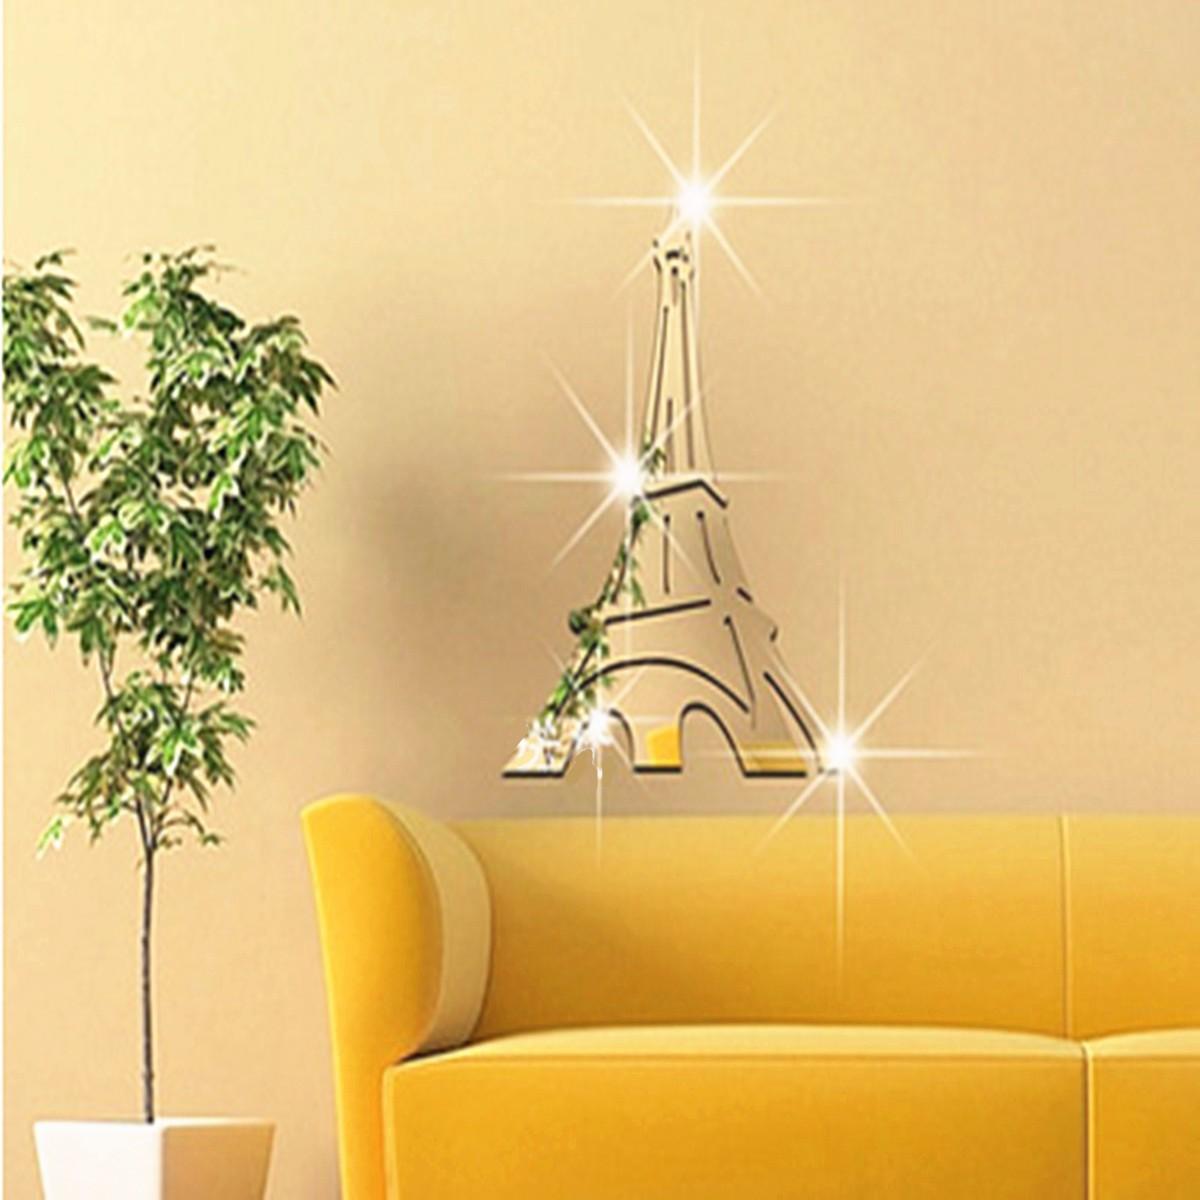 Home Decor and Decorating Idea - Elitflat